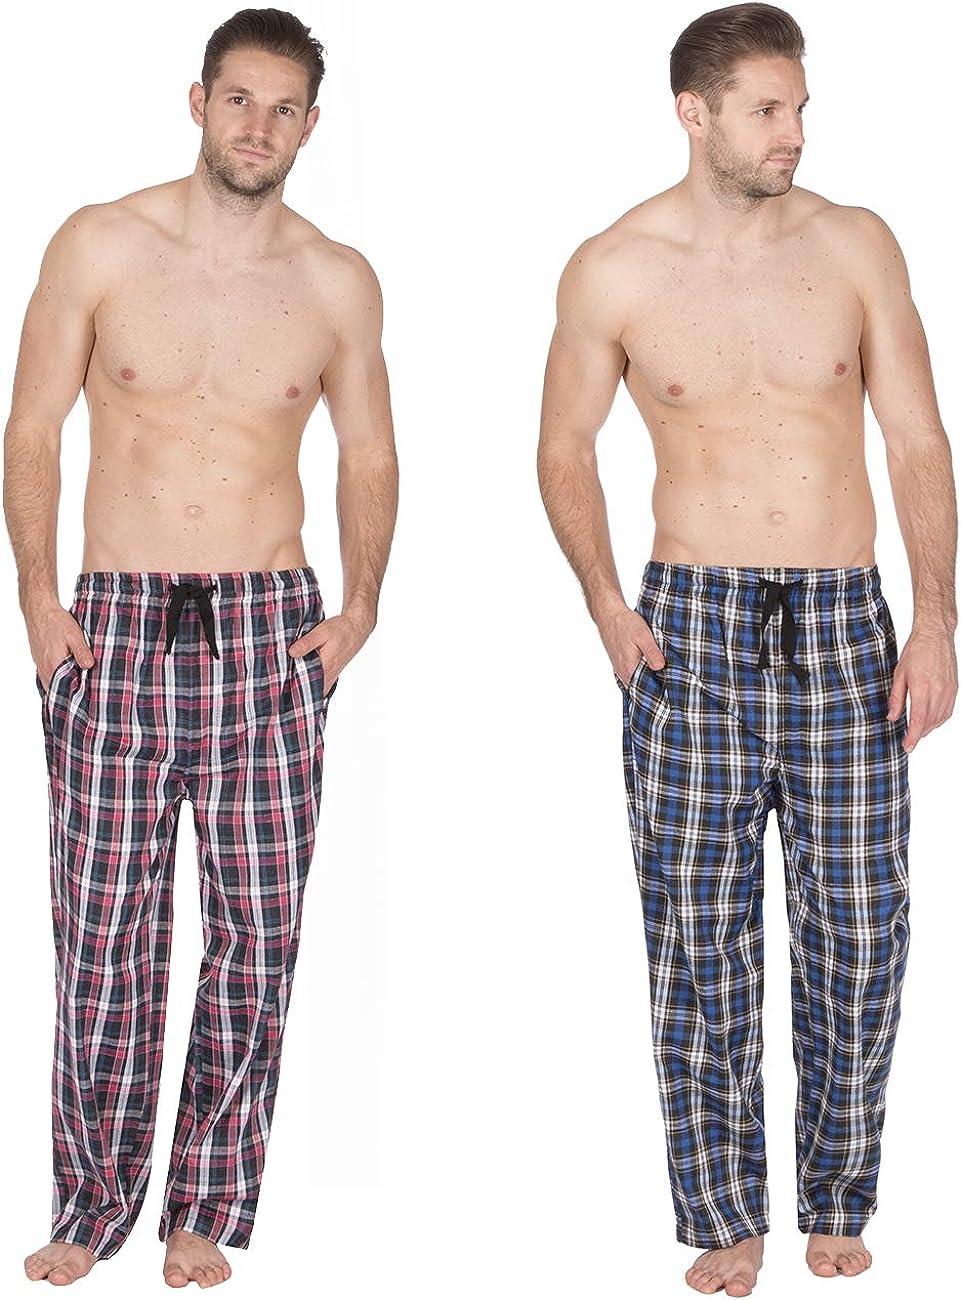 Checked Fleece Pajama Bottoms Jason Jones Mens Woven Lounge Pants